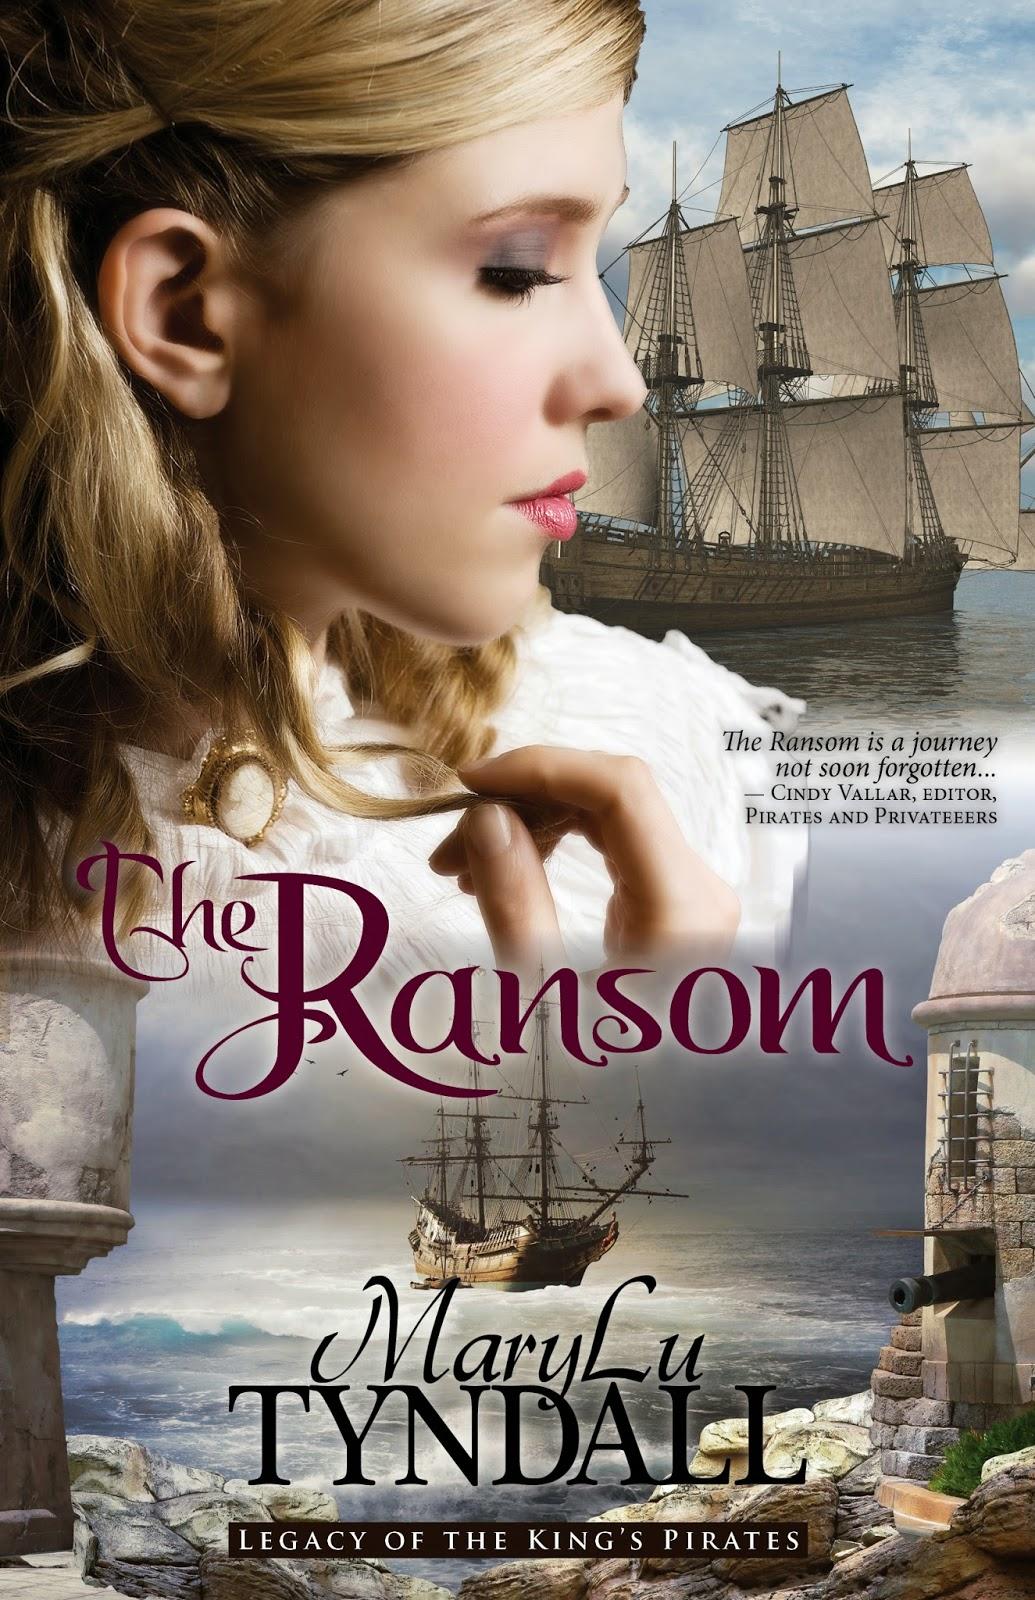 http://www.amazon.com/The-Ransom-Legacy-Kings-Pirates/dp/0991092120/ref=sr_1_3?ie=UTF8&qid=1399065223&sr=8-3&keywords=marylu+tyndall